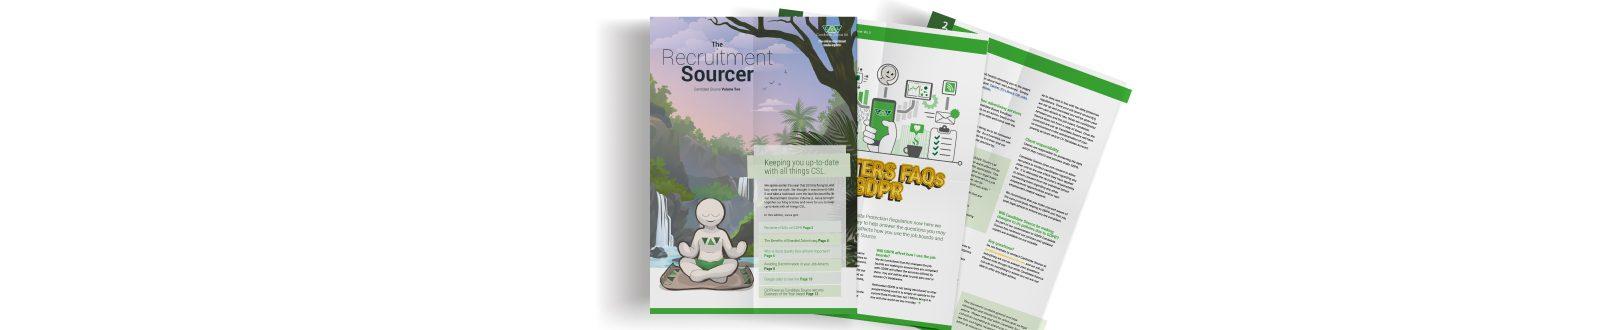 Recruitment Sourcer Volume 2